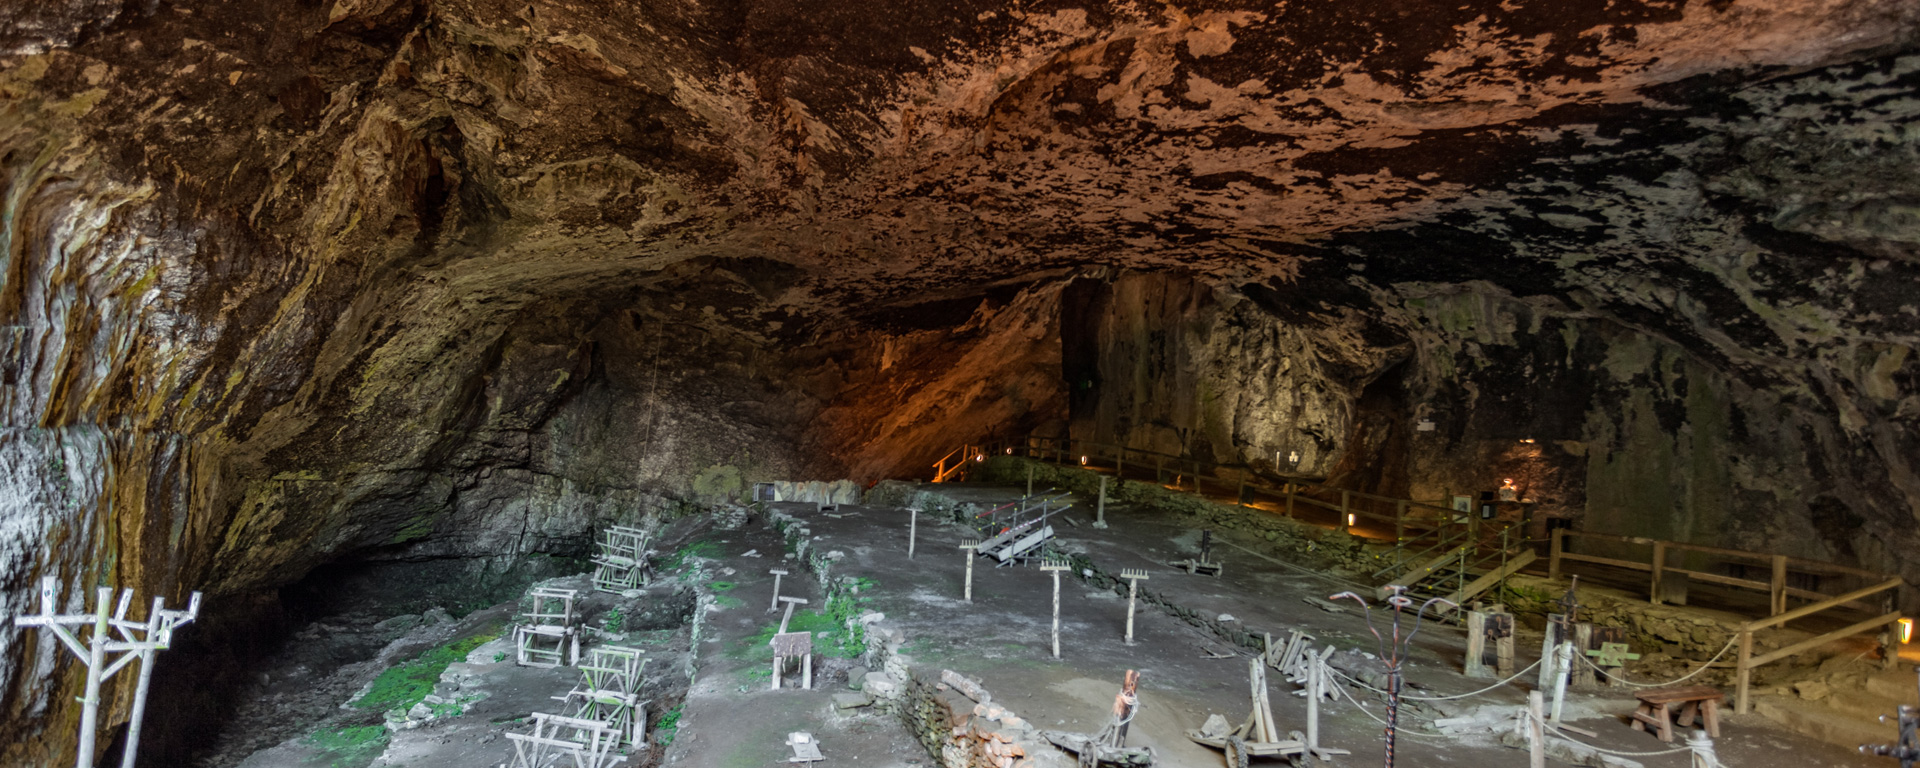 Peak Cavern - Derbyshire, England